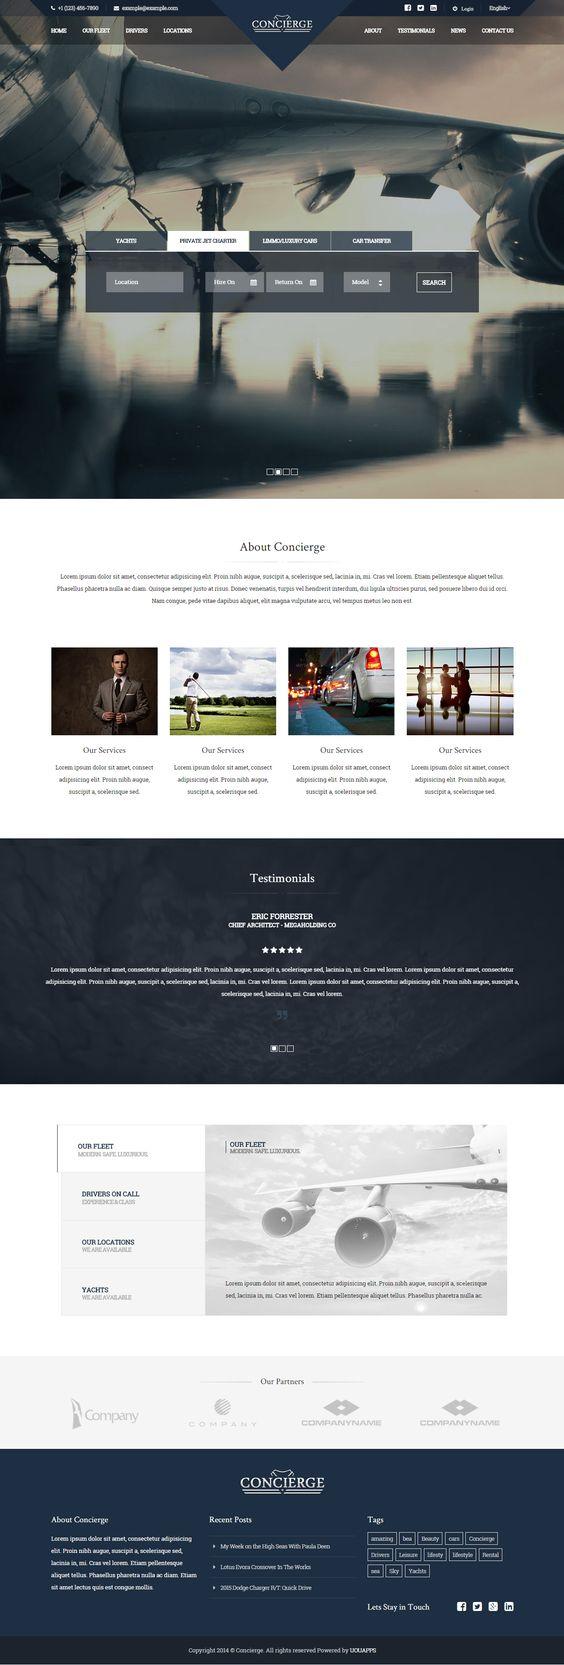 Google themes video - Concierge Is Premium Full Responsive Wordpress Luxury Theme Woocommerce Video Background Angularjs Google Map Elegant Test Free Demo At Themeforest